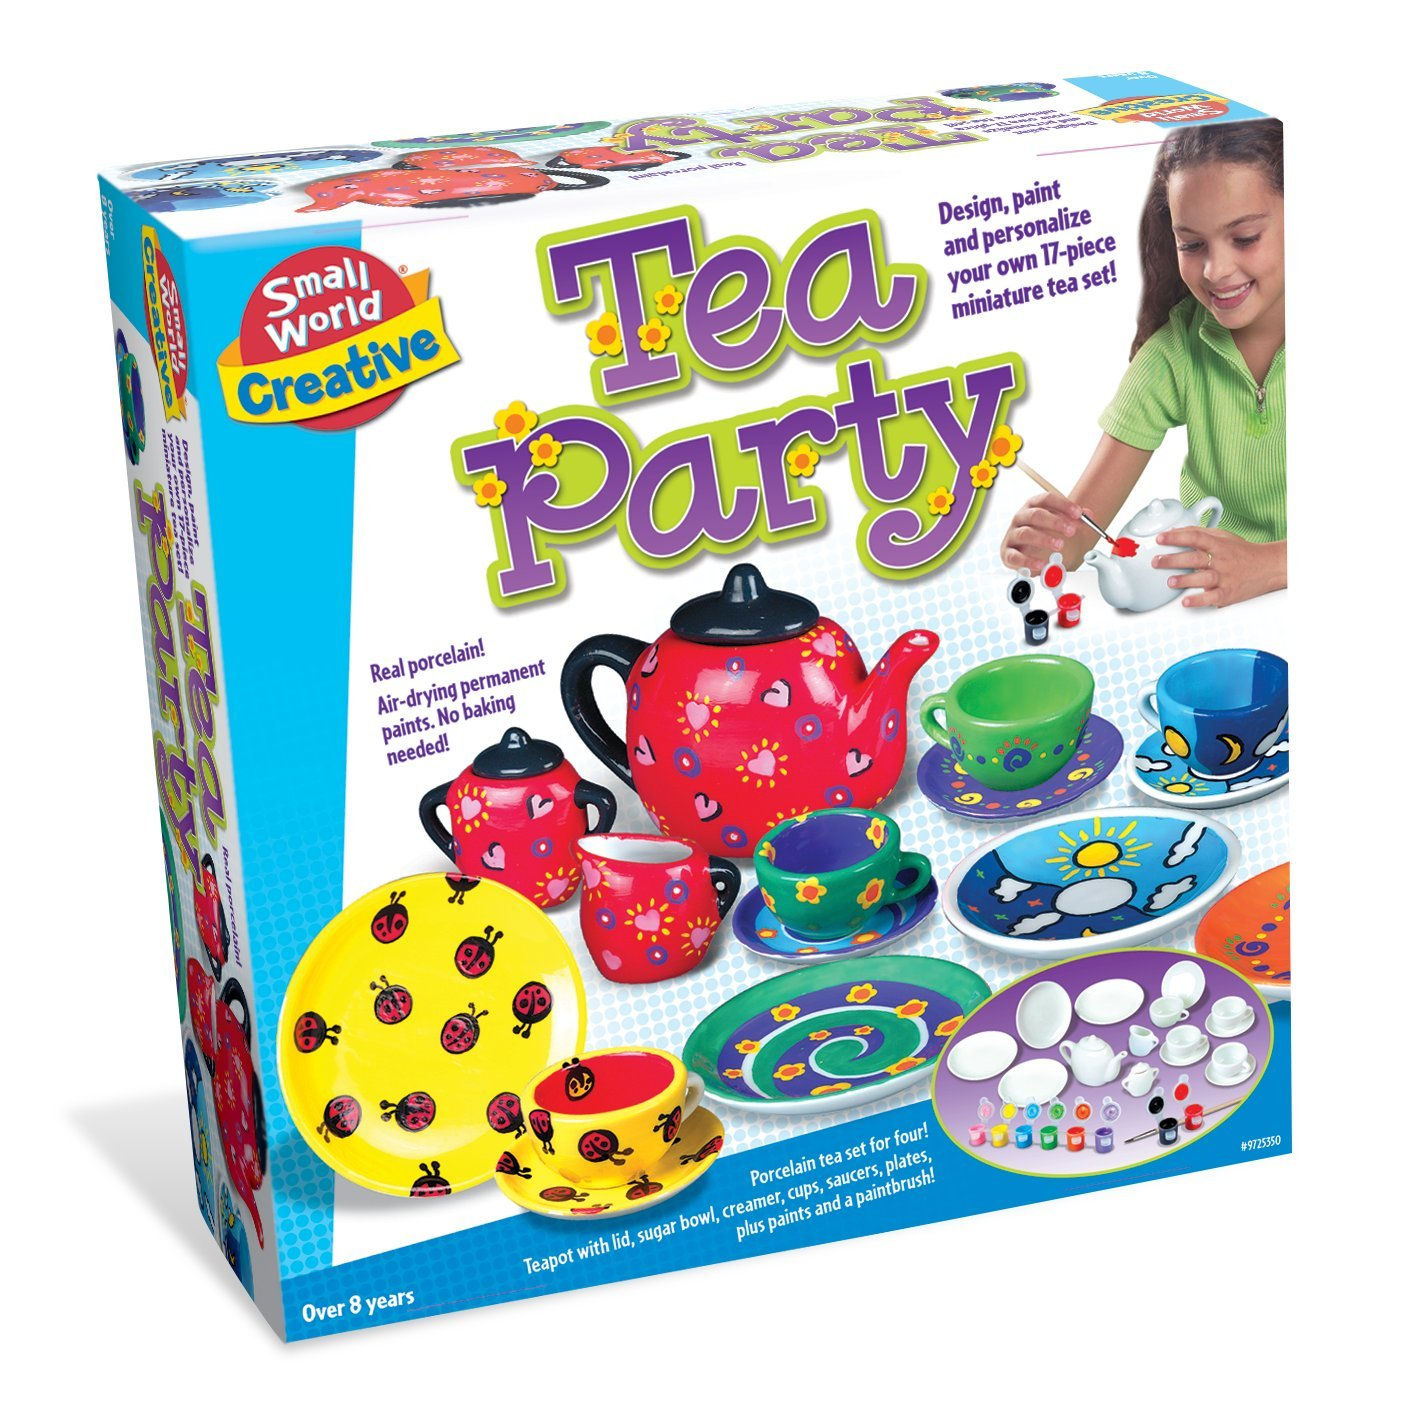 Small World Toys Creative - Tea Party 17 Pc. Porcelain Set